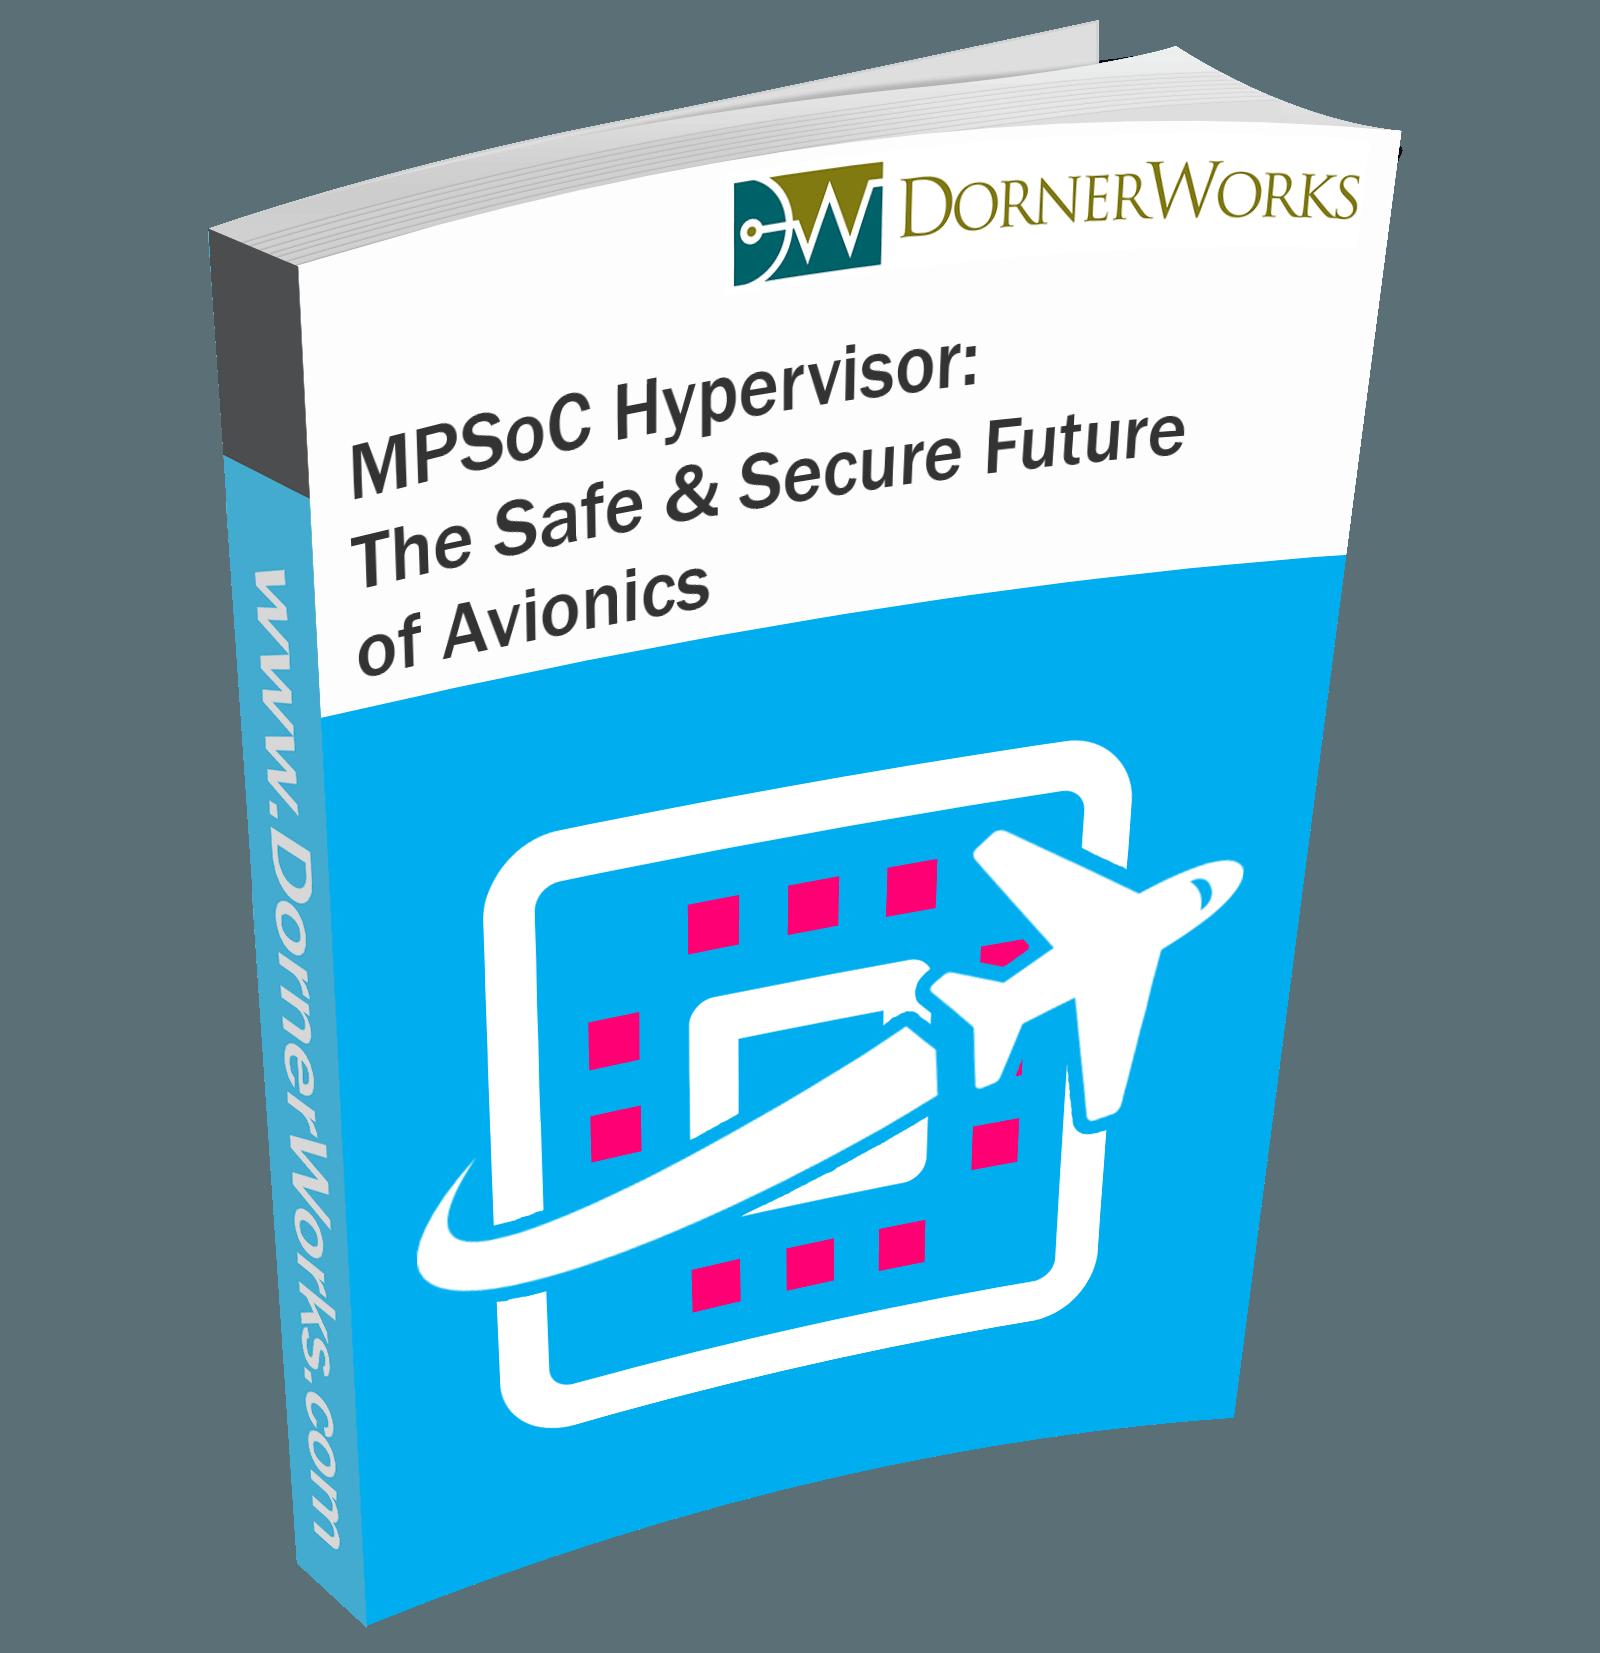 MPSoC Hypervisor: The Safe & Secure Future of Avionics